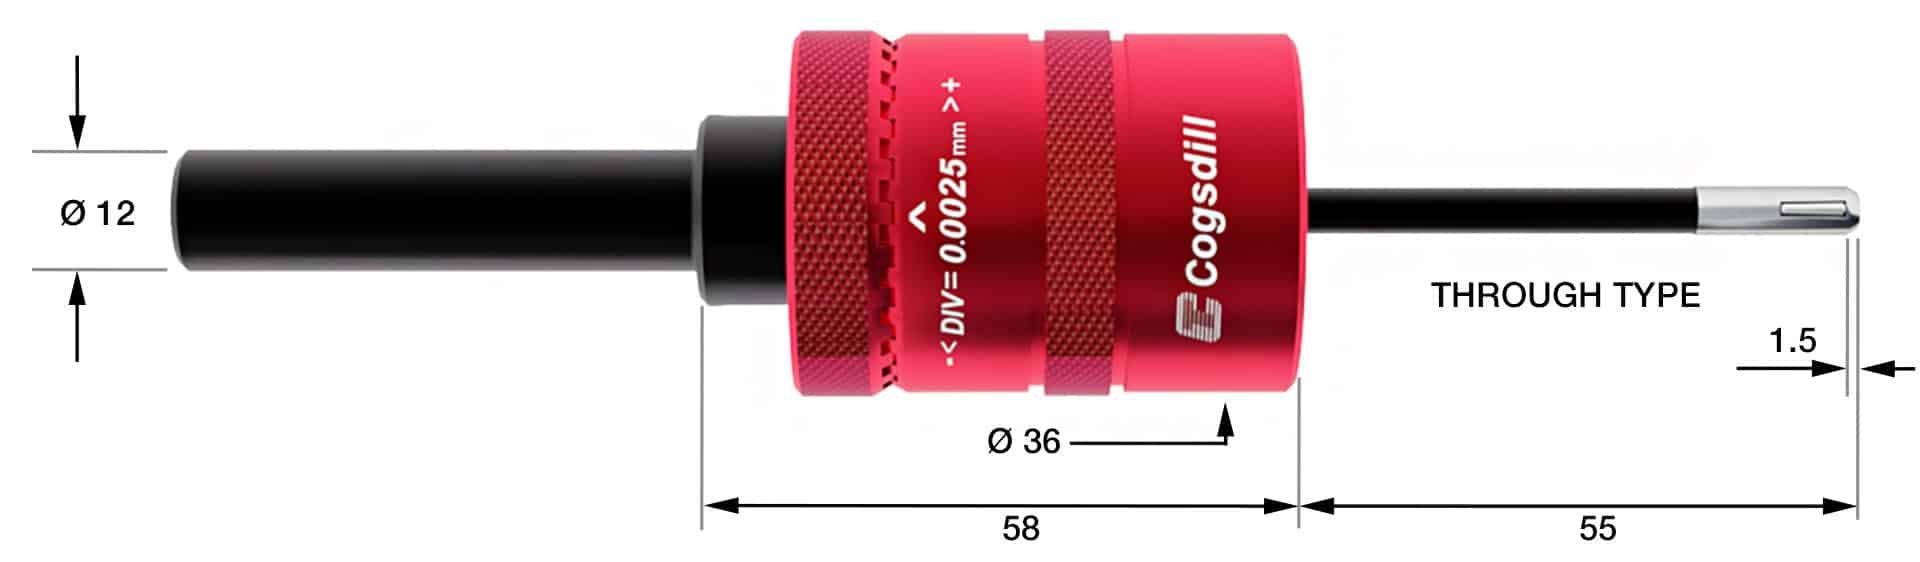 Rollen-Burnishing SRM-5-4-575 Diagramm